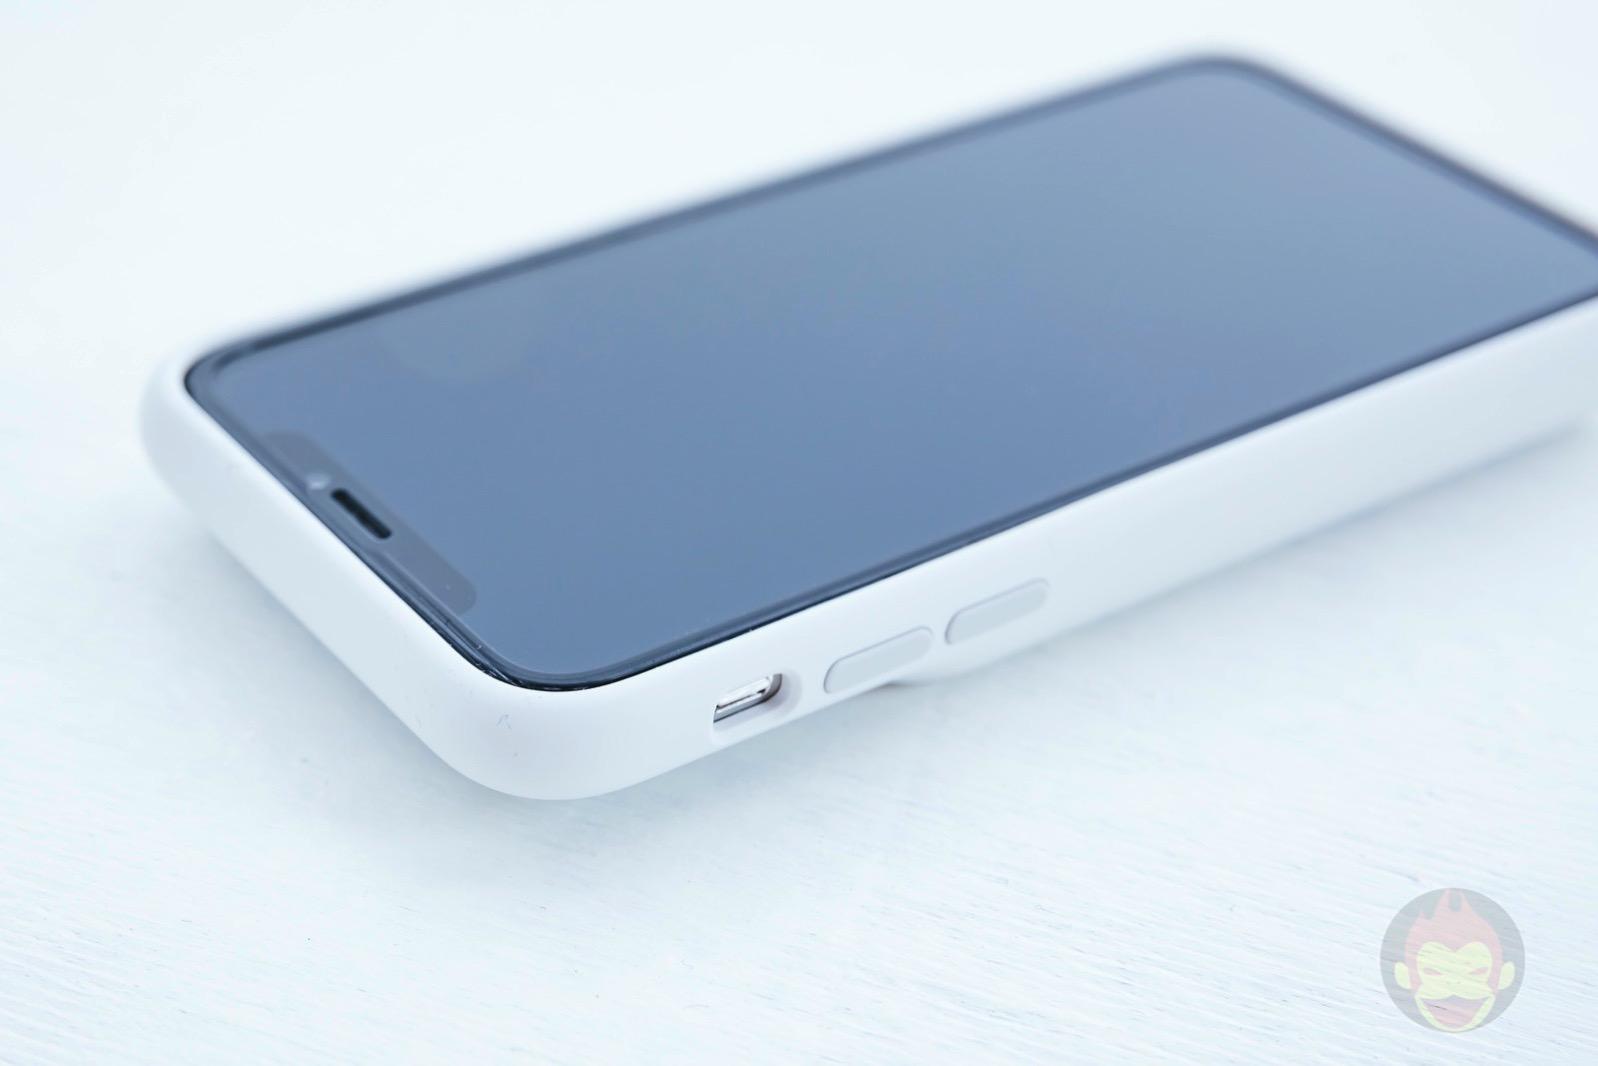 Smart-Battery-Case-for-iPhoneXS-Review-08.jpg